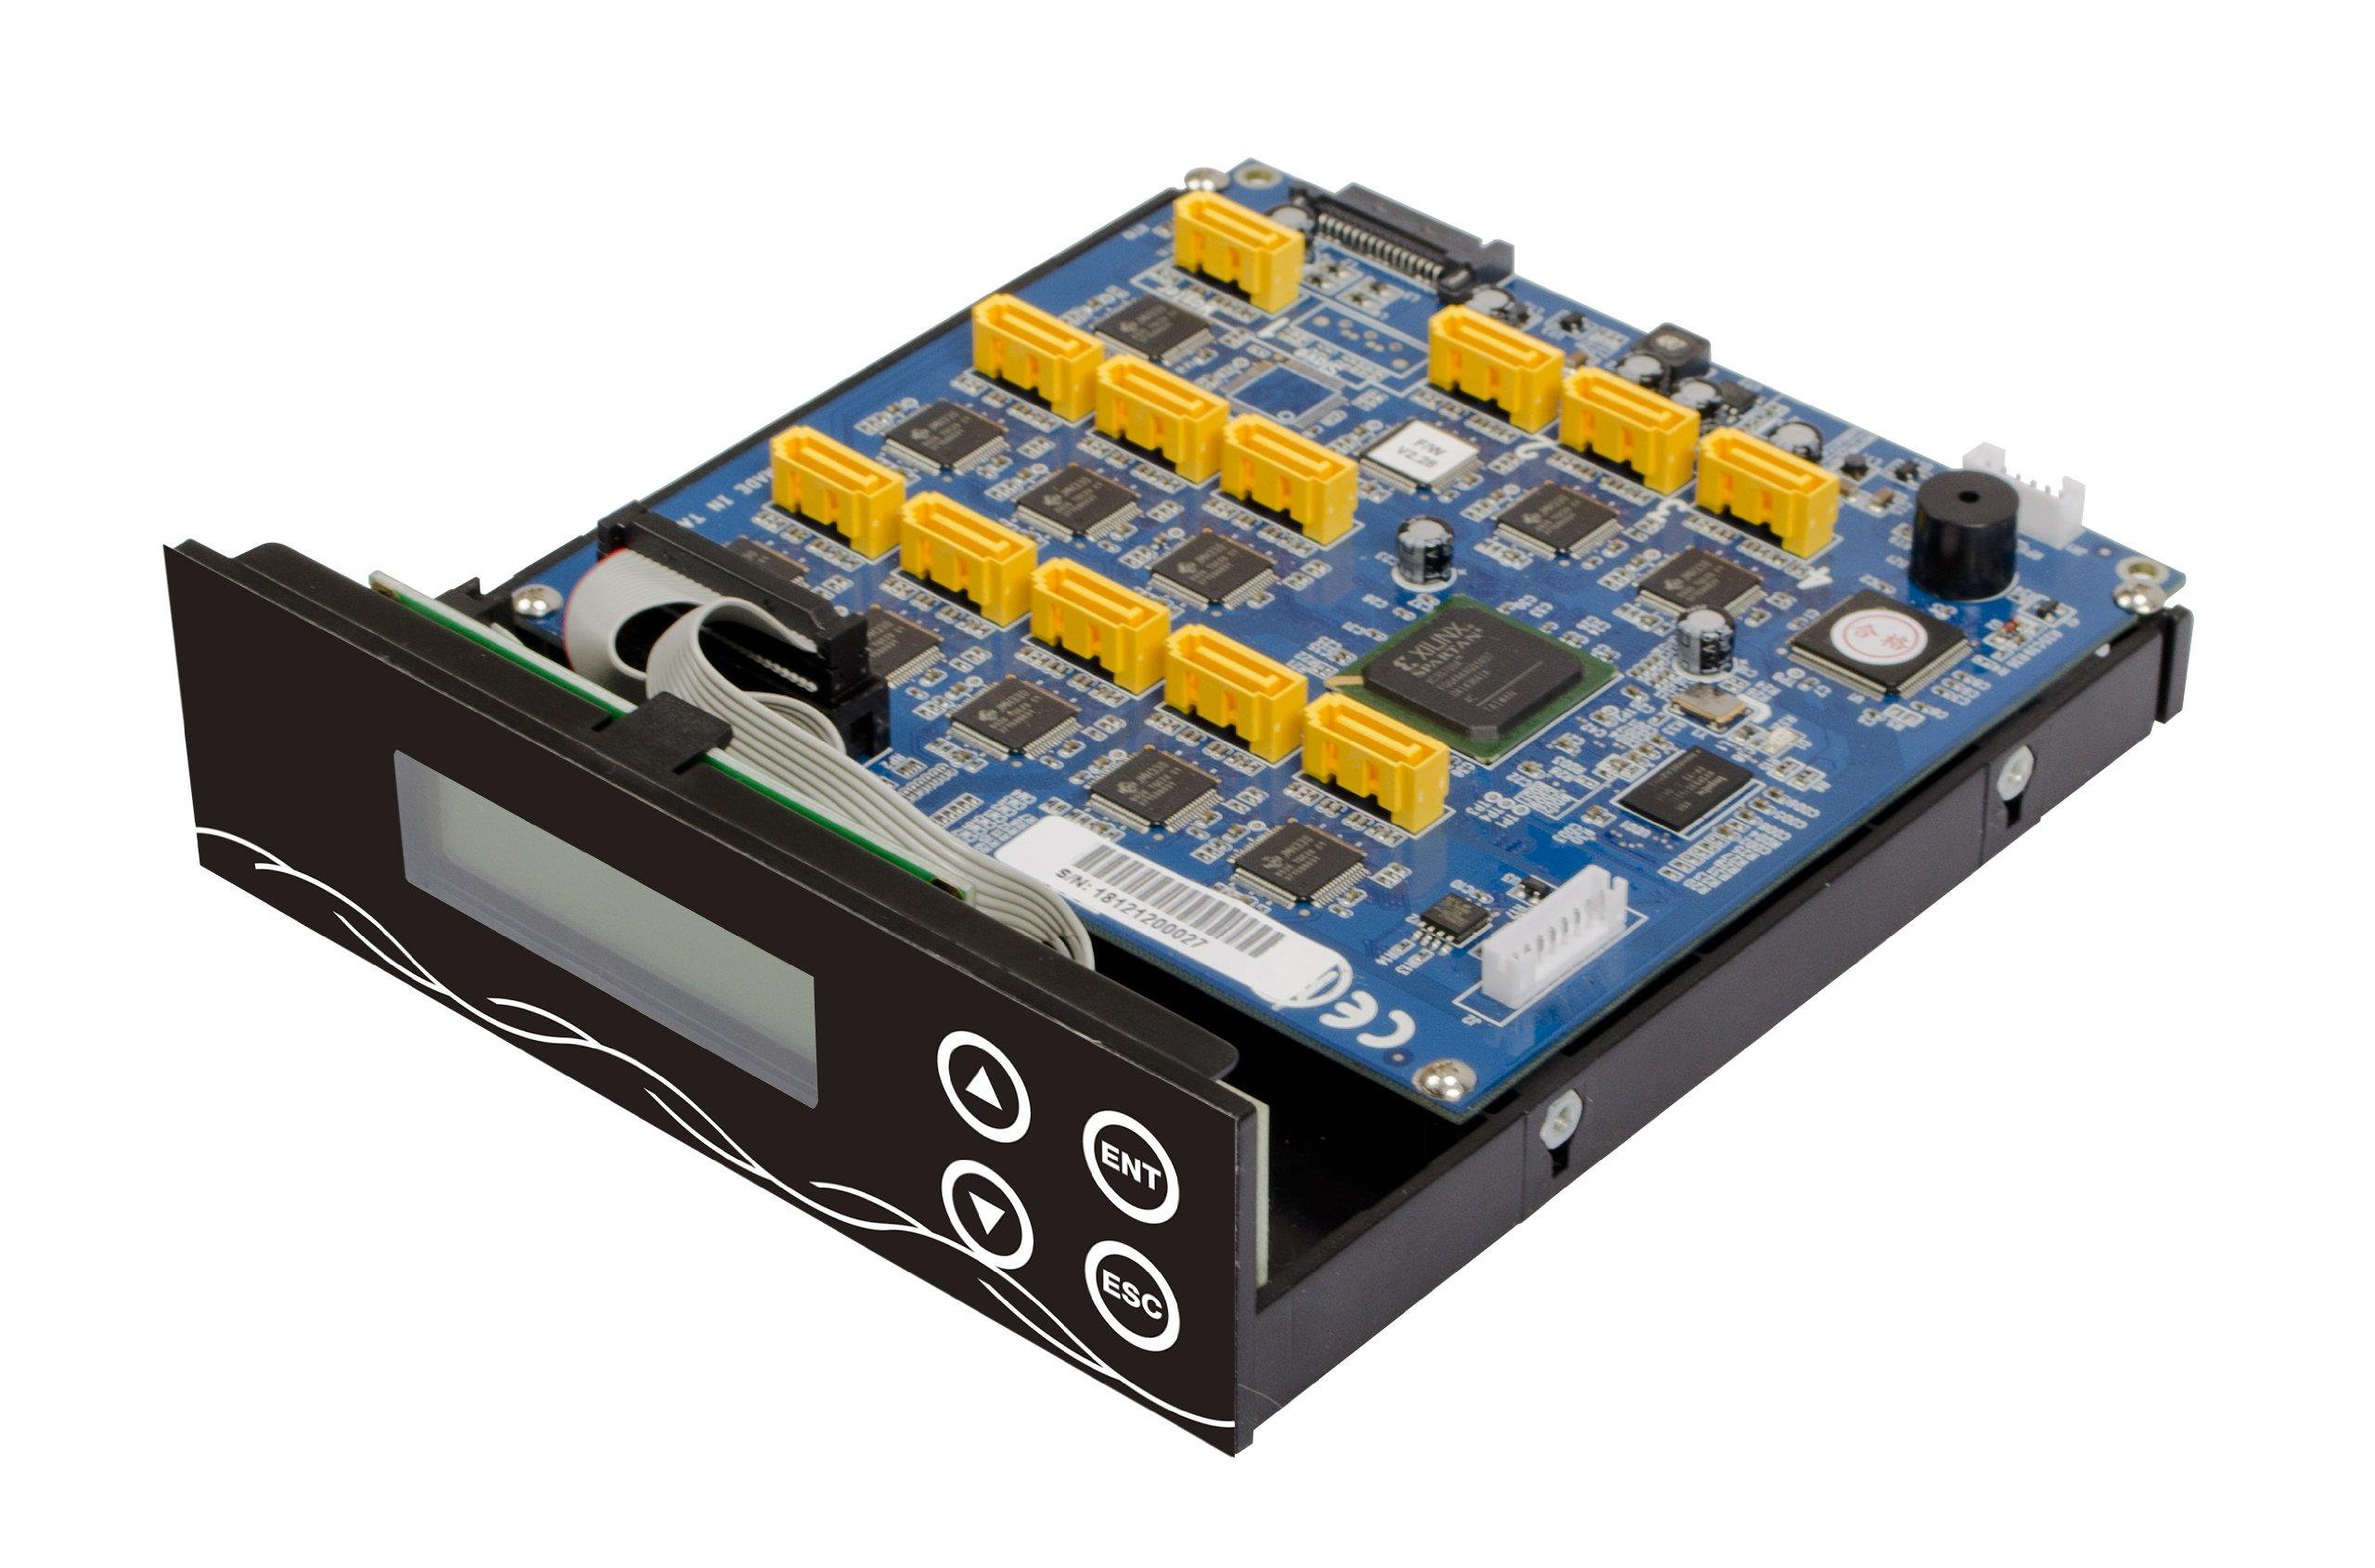 Bestduplicator Premium Series Controllers (1 to 11)